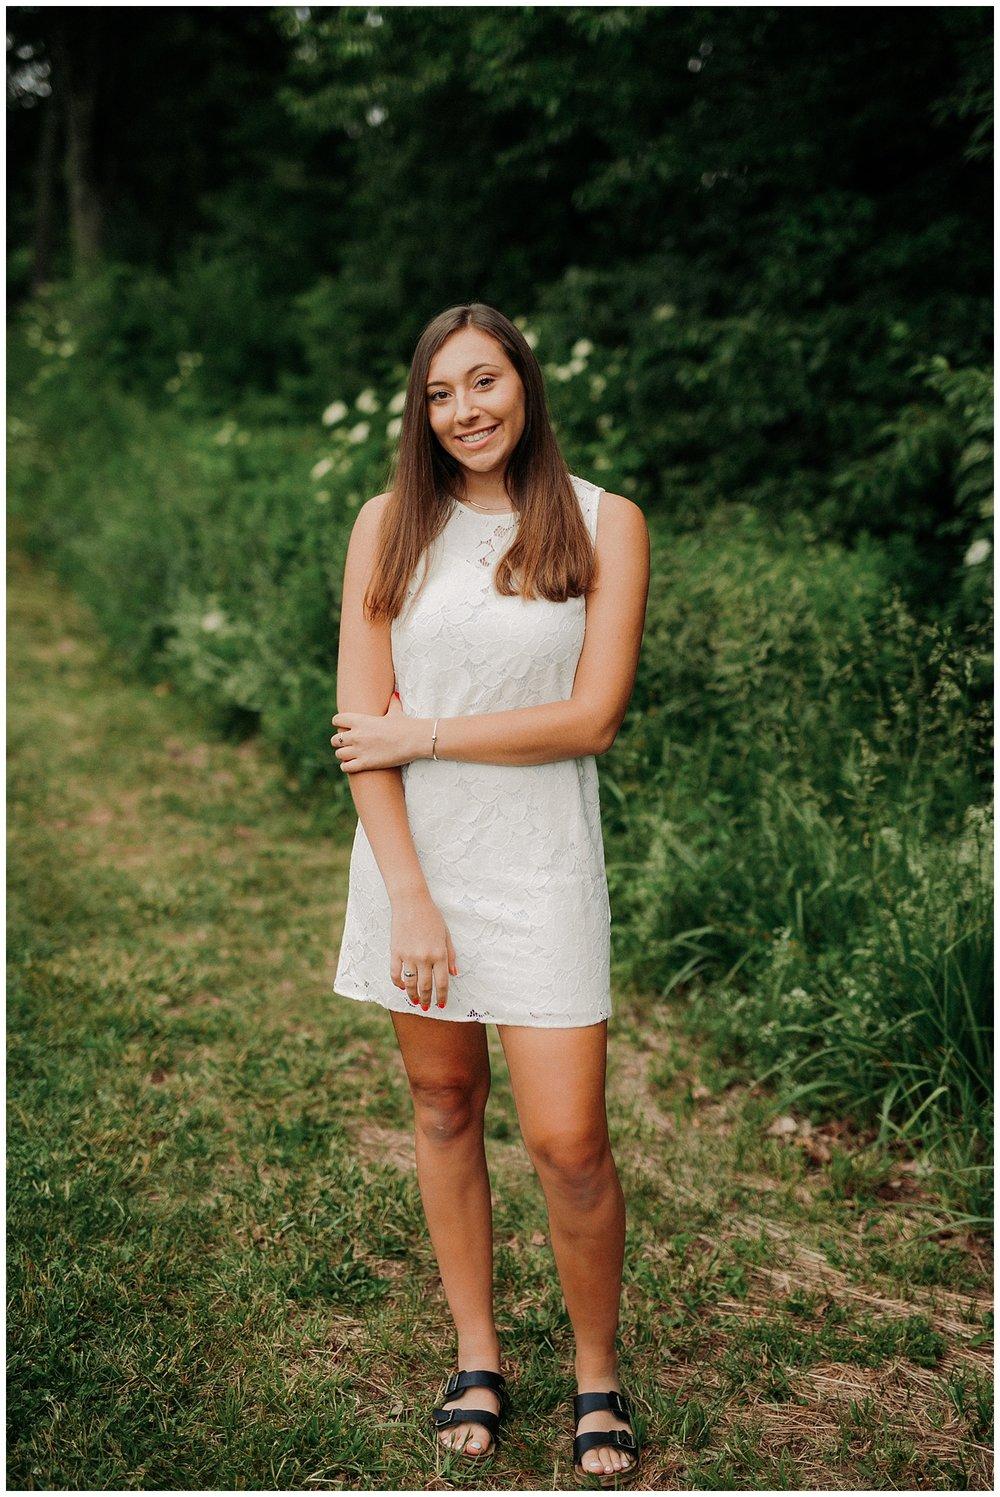 lindybeth photography - senior pictures - eliza-5.jpg